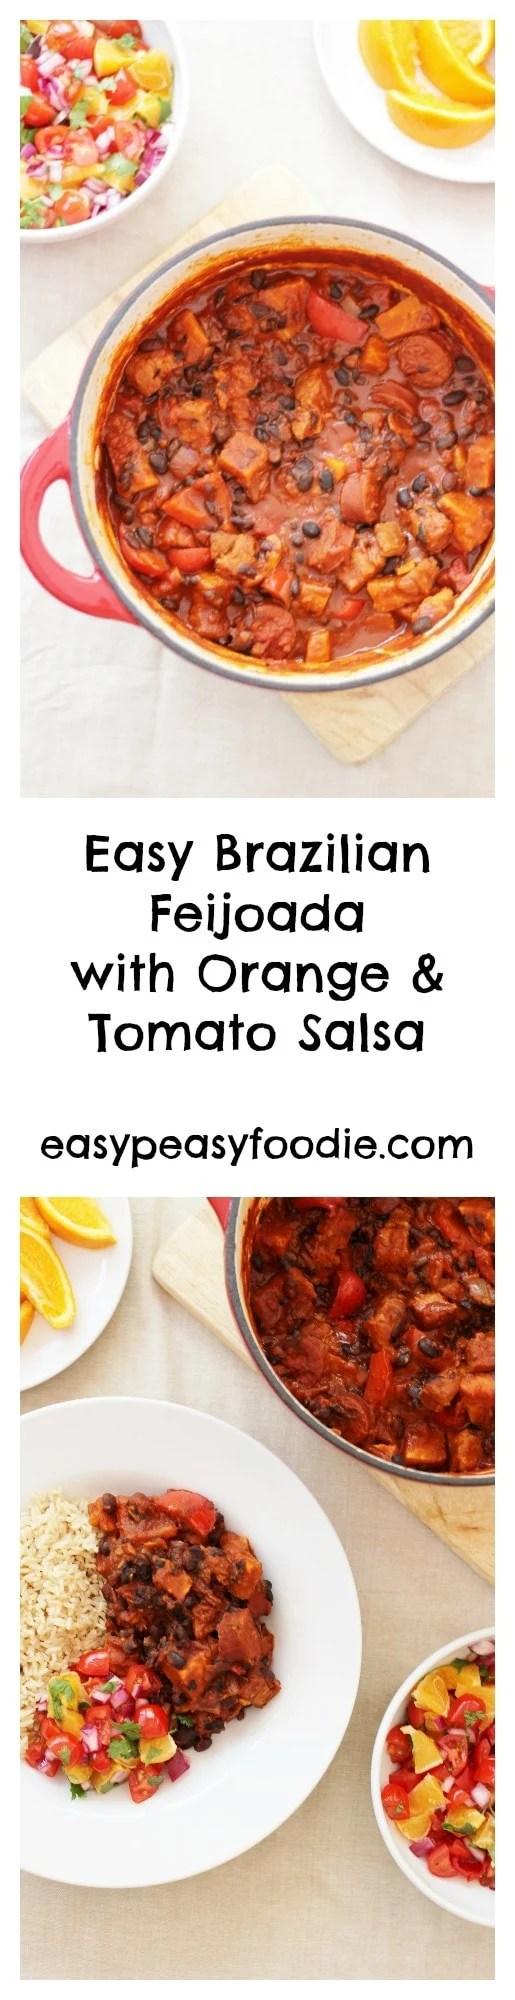 Easy brazilian feijoada with orange and tomato salsa easy peasy easy brazilian feijoada with orange and tomato salsa forumfinder Image collections